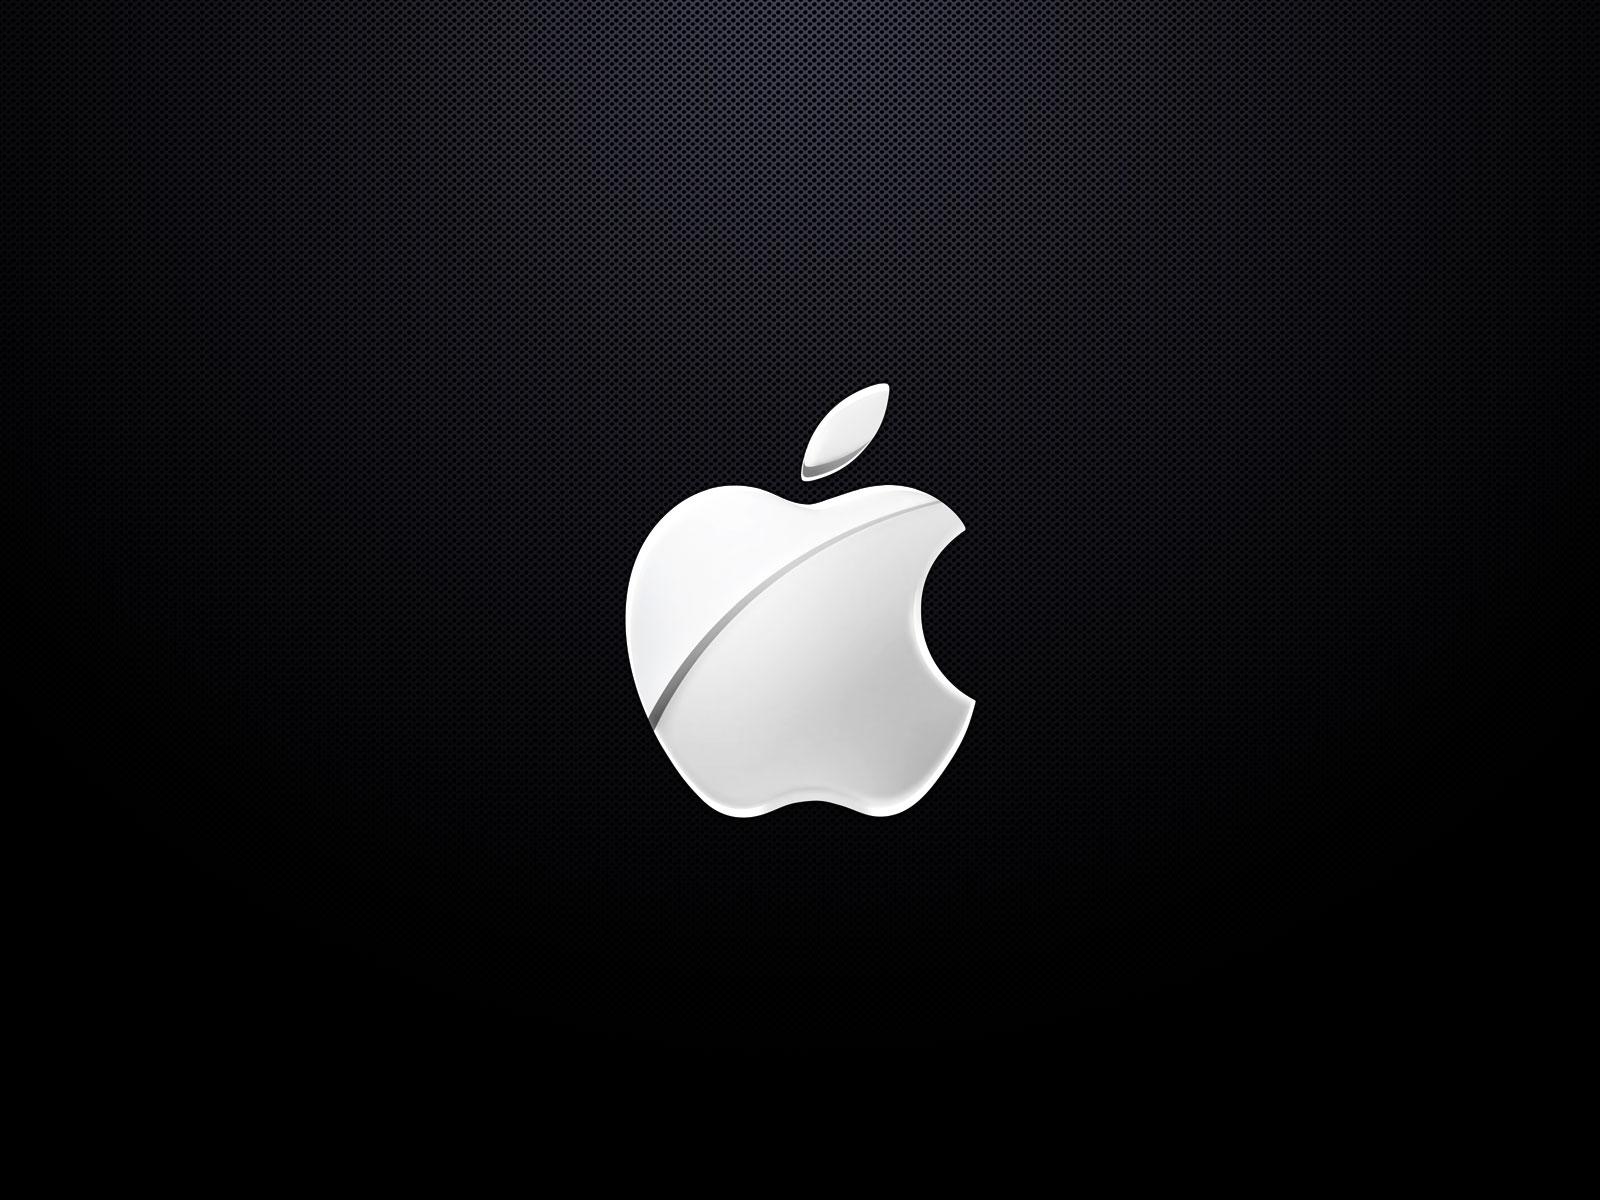 http://1.bp.blogspot.com/-kKCmQQGgvaA/TY18b-e-dJI/AAAAAAAAHes/aT_aOq3eETw/s1600/Mac-Wallpaper-Apple-Mac-Wallpapers-Snow-Leopard-Wallpapers-HD-Apple-iPhone-Free-Desktop-Backgrounds-Red%2BBlack-Apple-super-mac-apple-lucy-pinder-wallpapers-indian-hollywood-ba